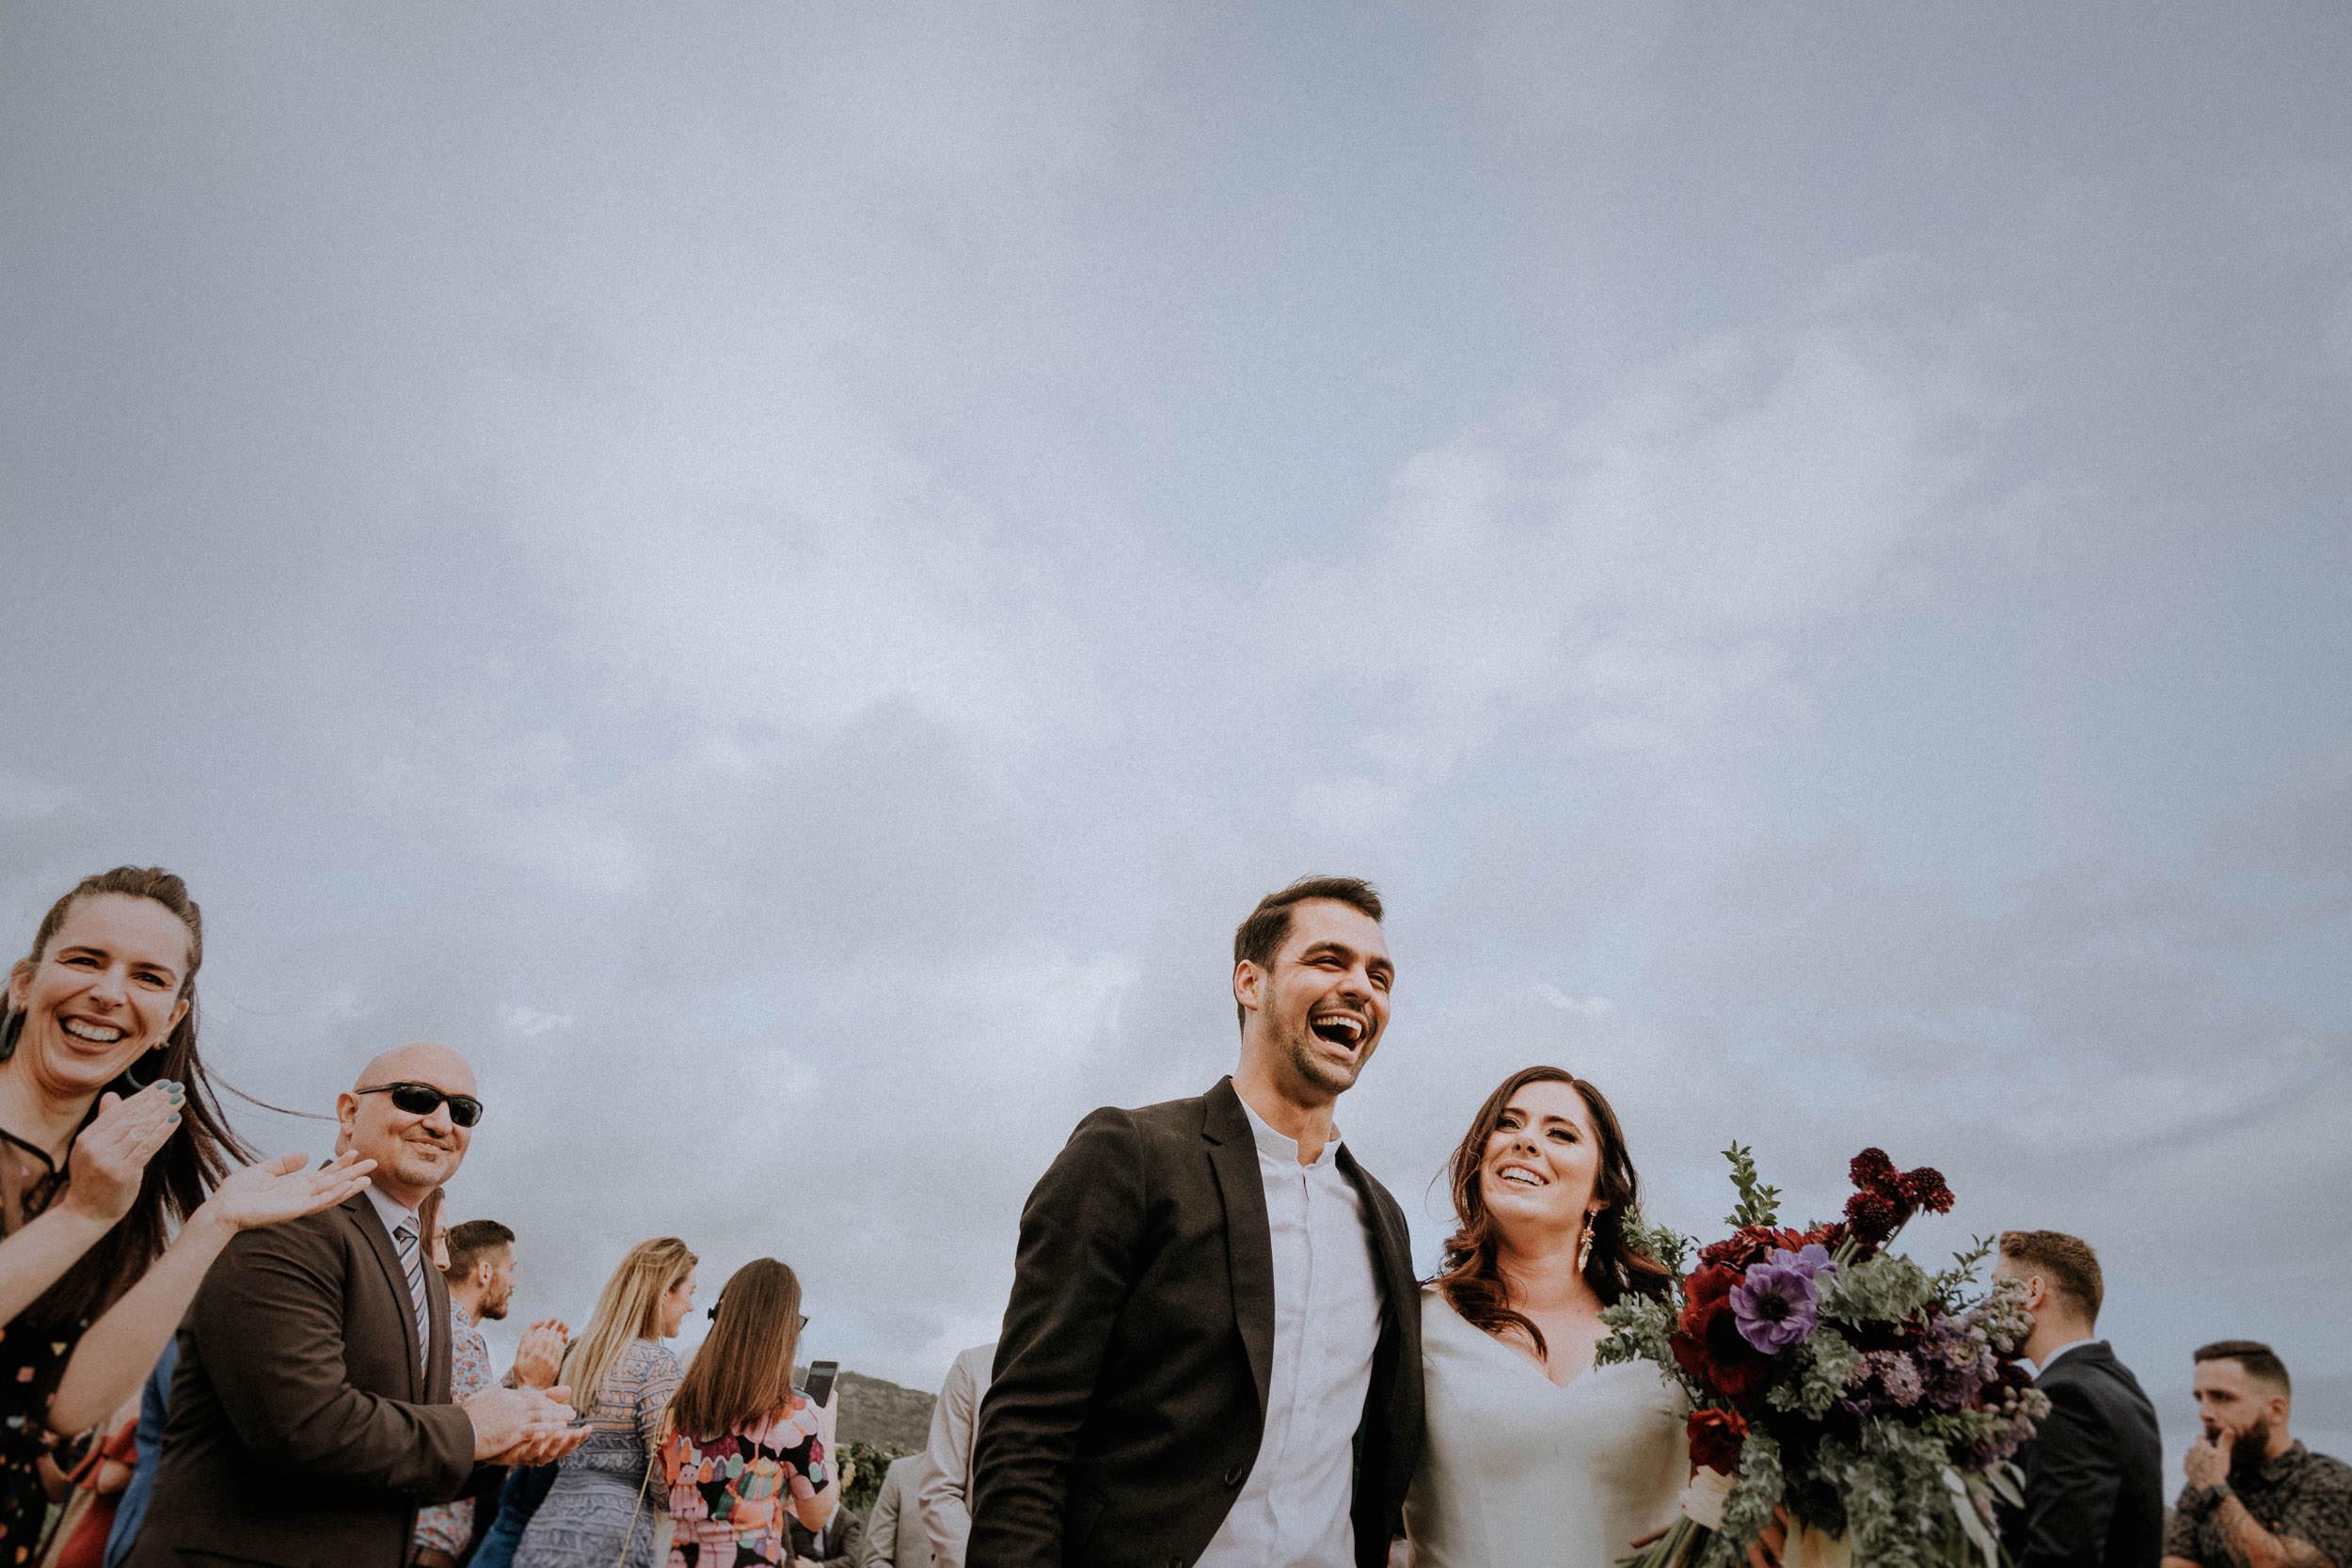 s+j_top_elopement wedding photography_kings & thieves_blog - 336.jpg